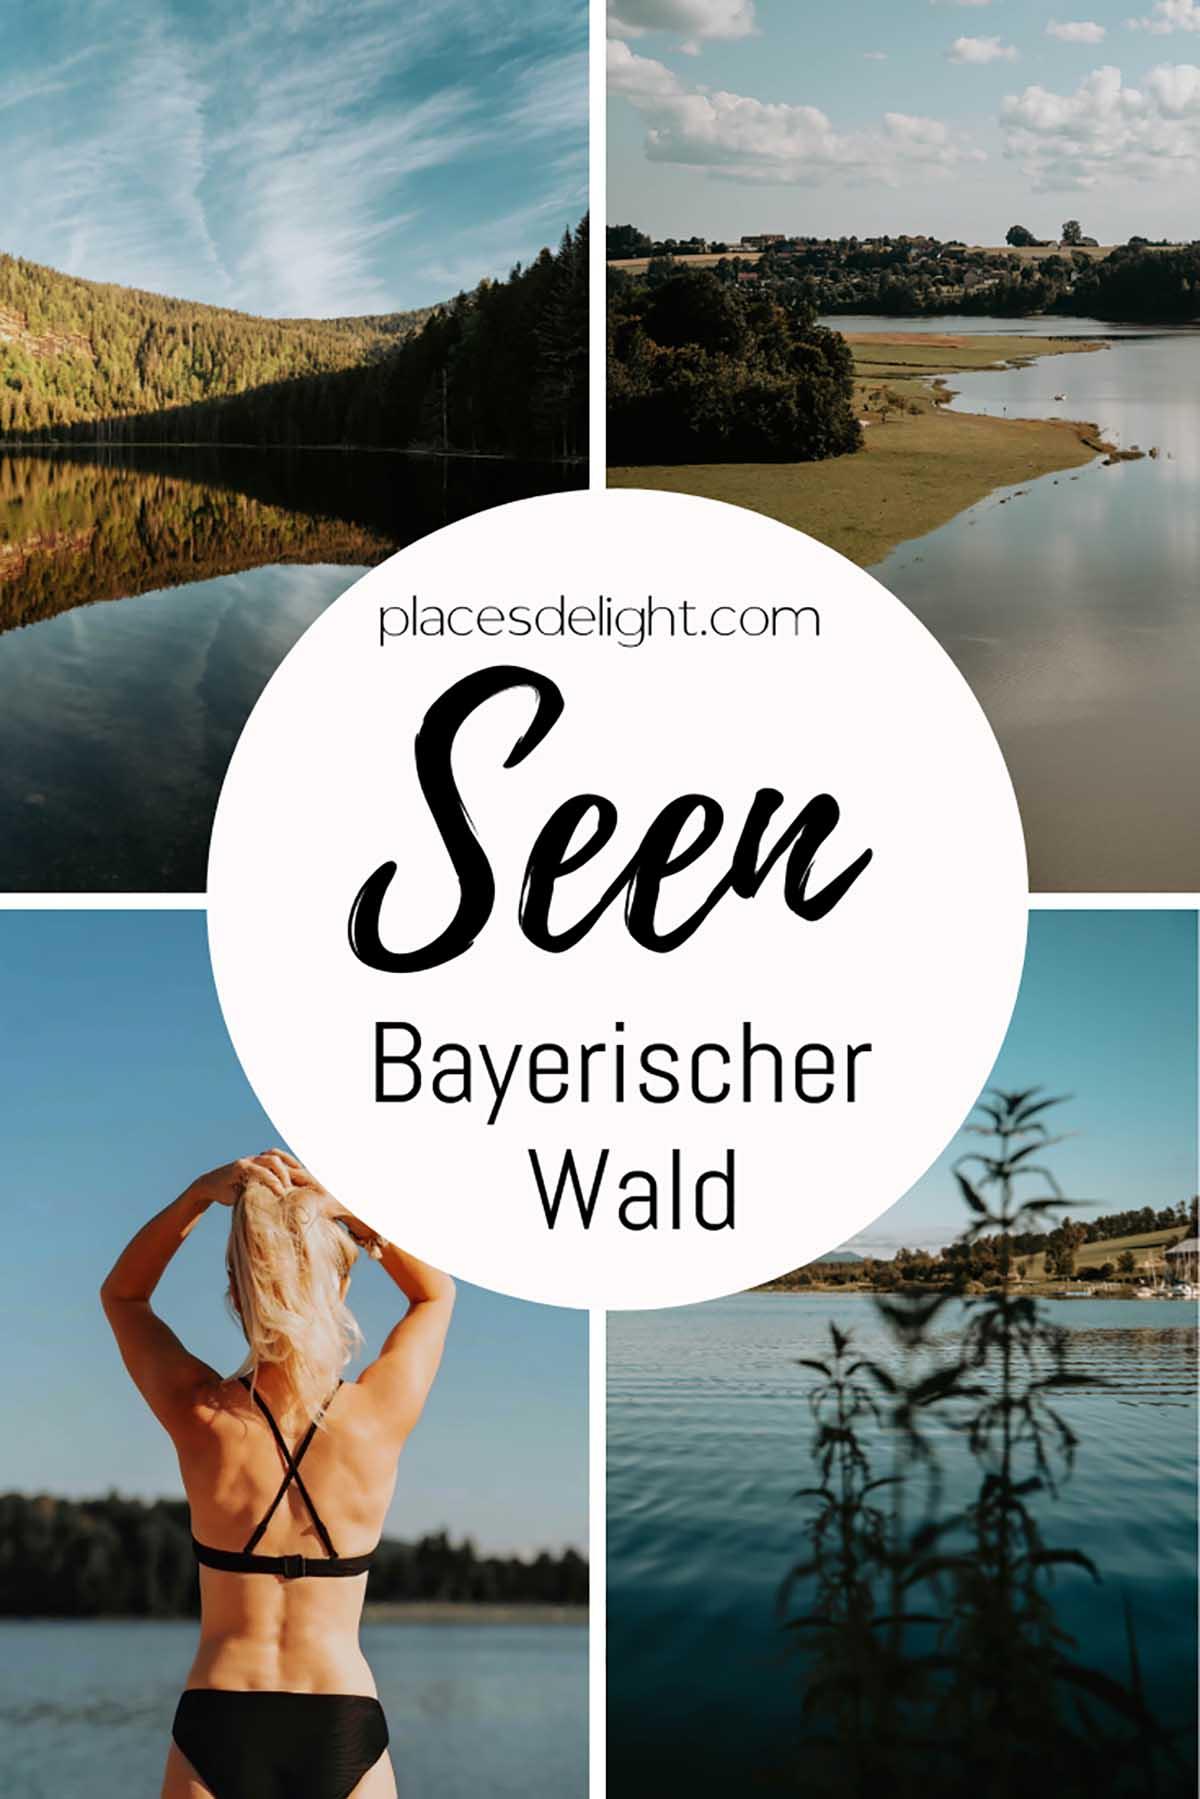 seen-bayerischer-wald-placesdelight